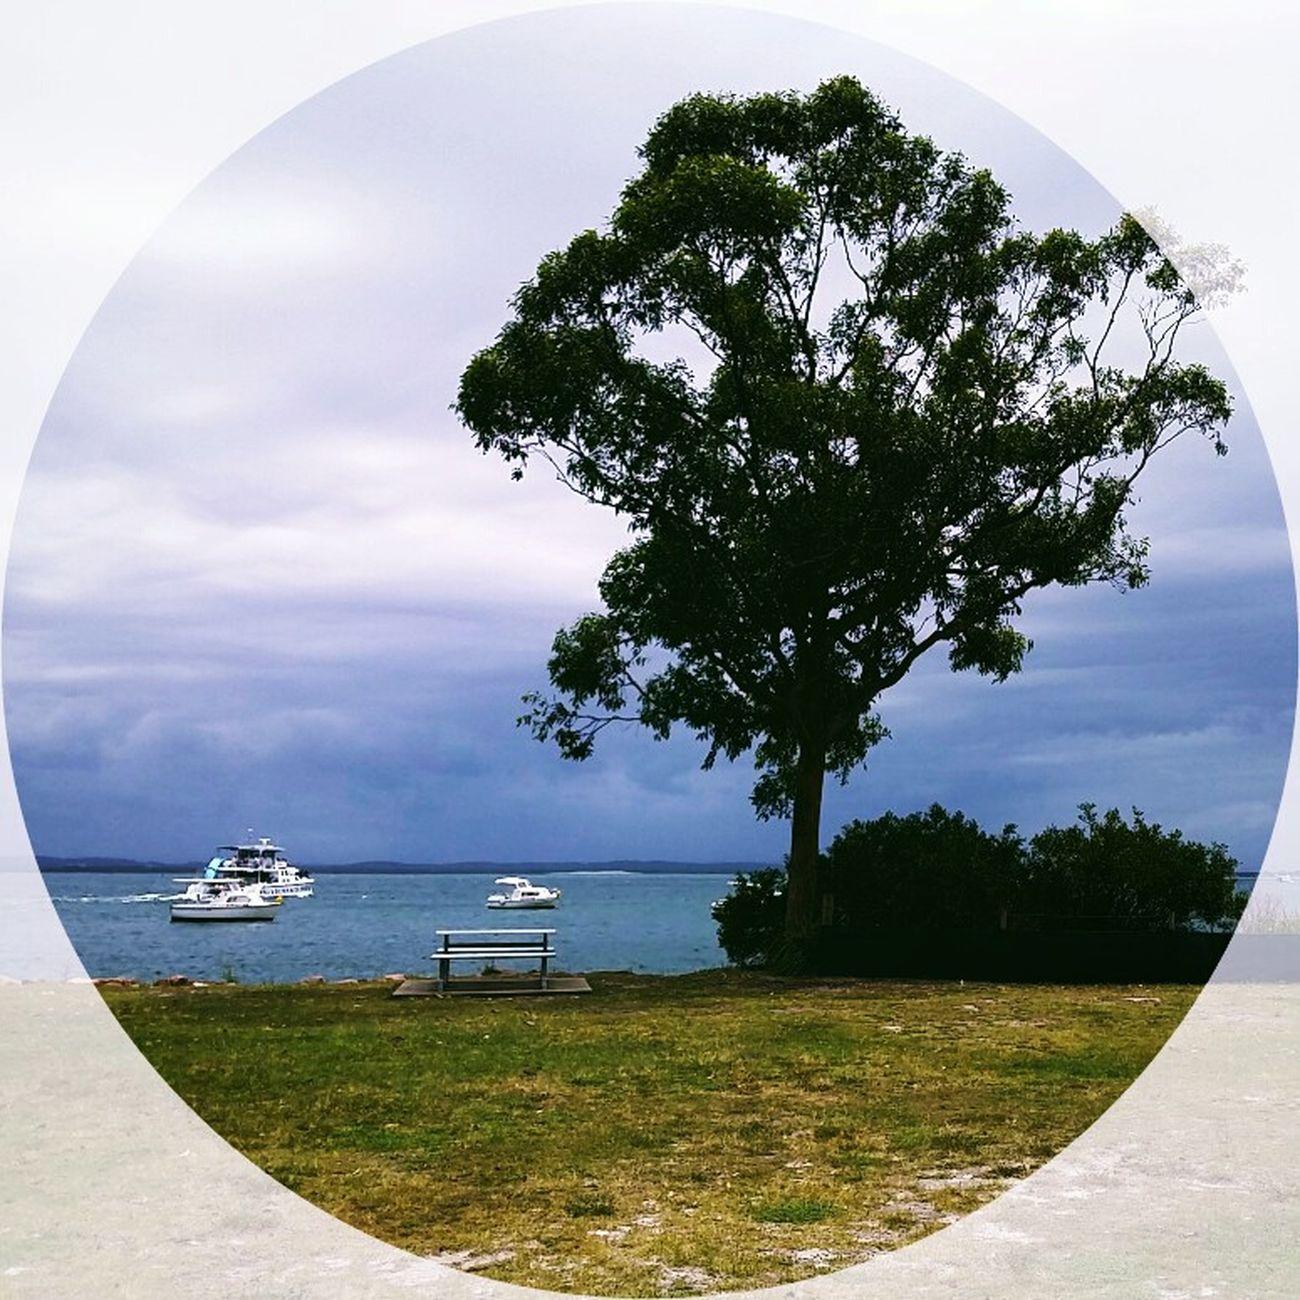 Portstephens Nelson Bay NSW Australia Australia Sky Water Trees